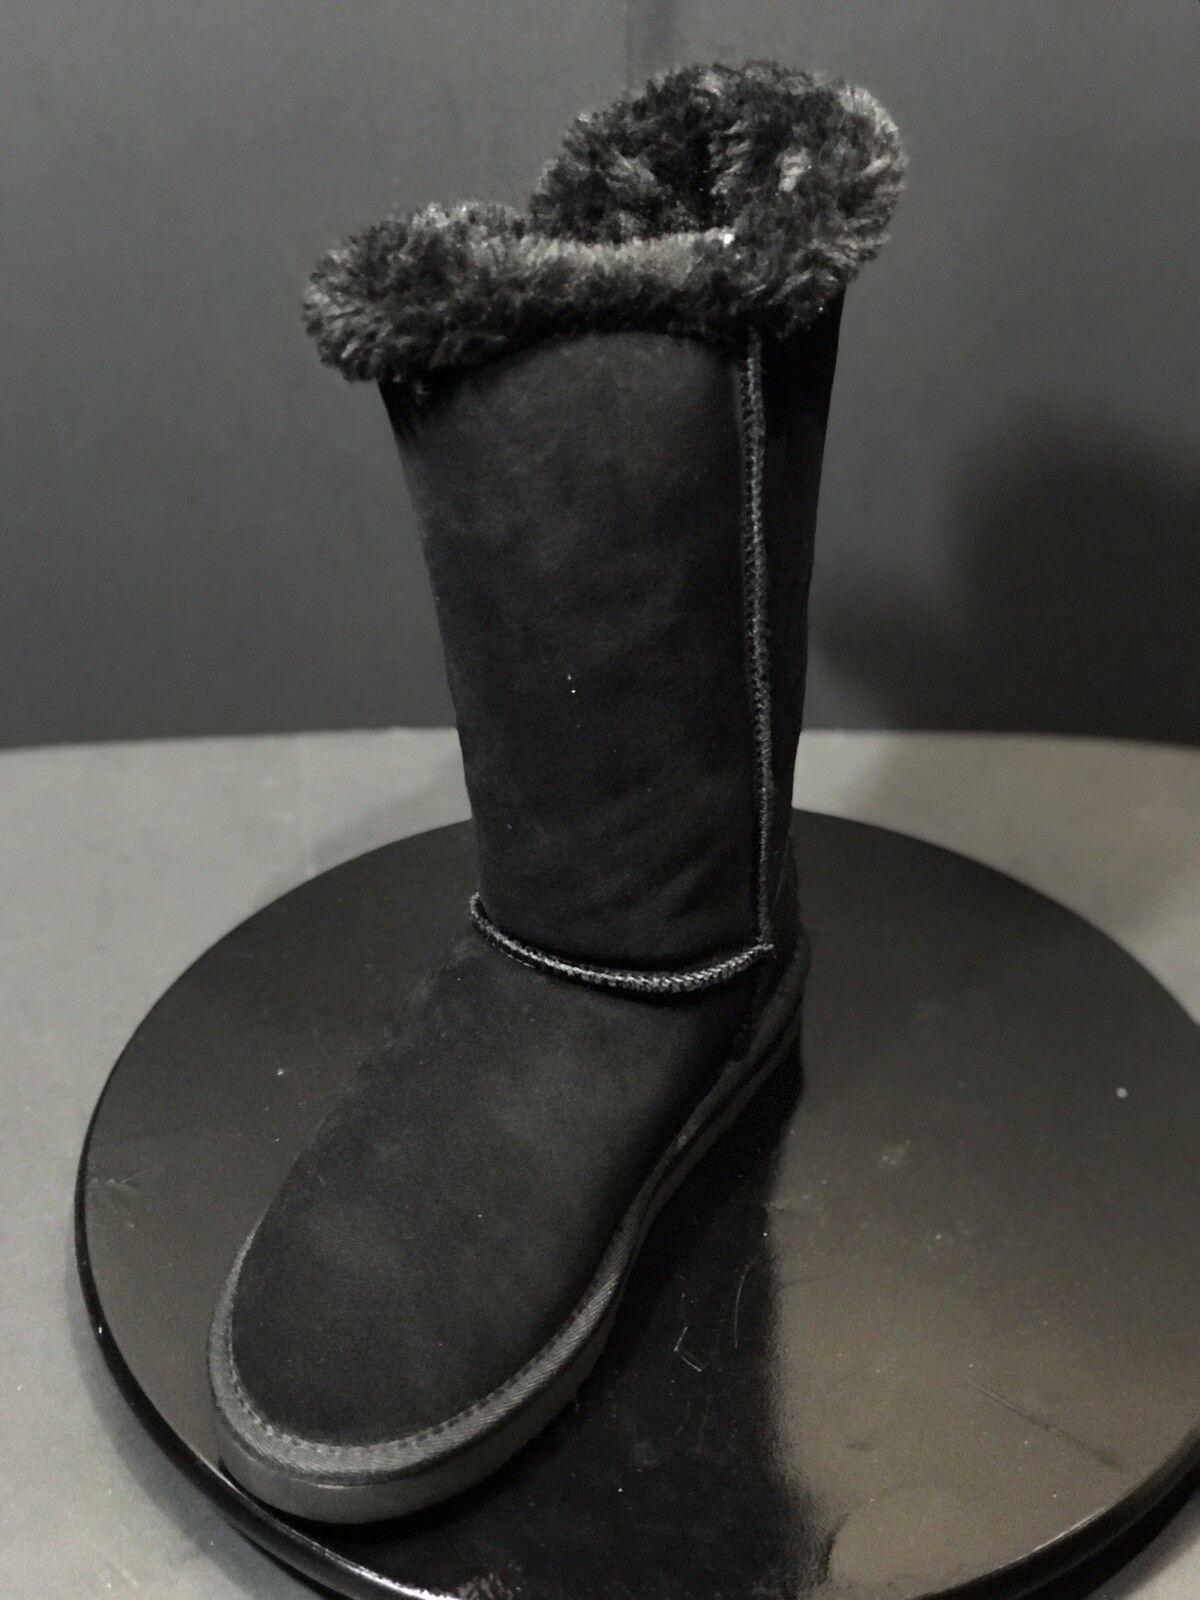 Nuevo Mujeres flojos cember dos nos botones Gamuza botas Altas Invierno Negro Tamaño nos dos 8 M ecda86